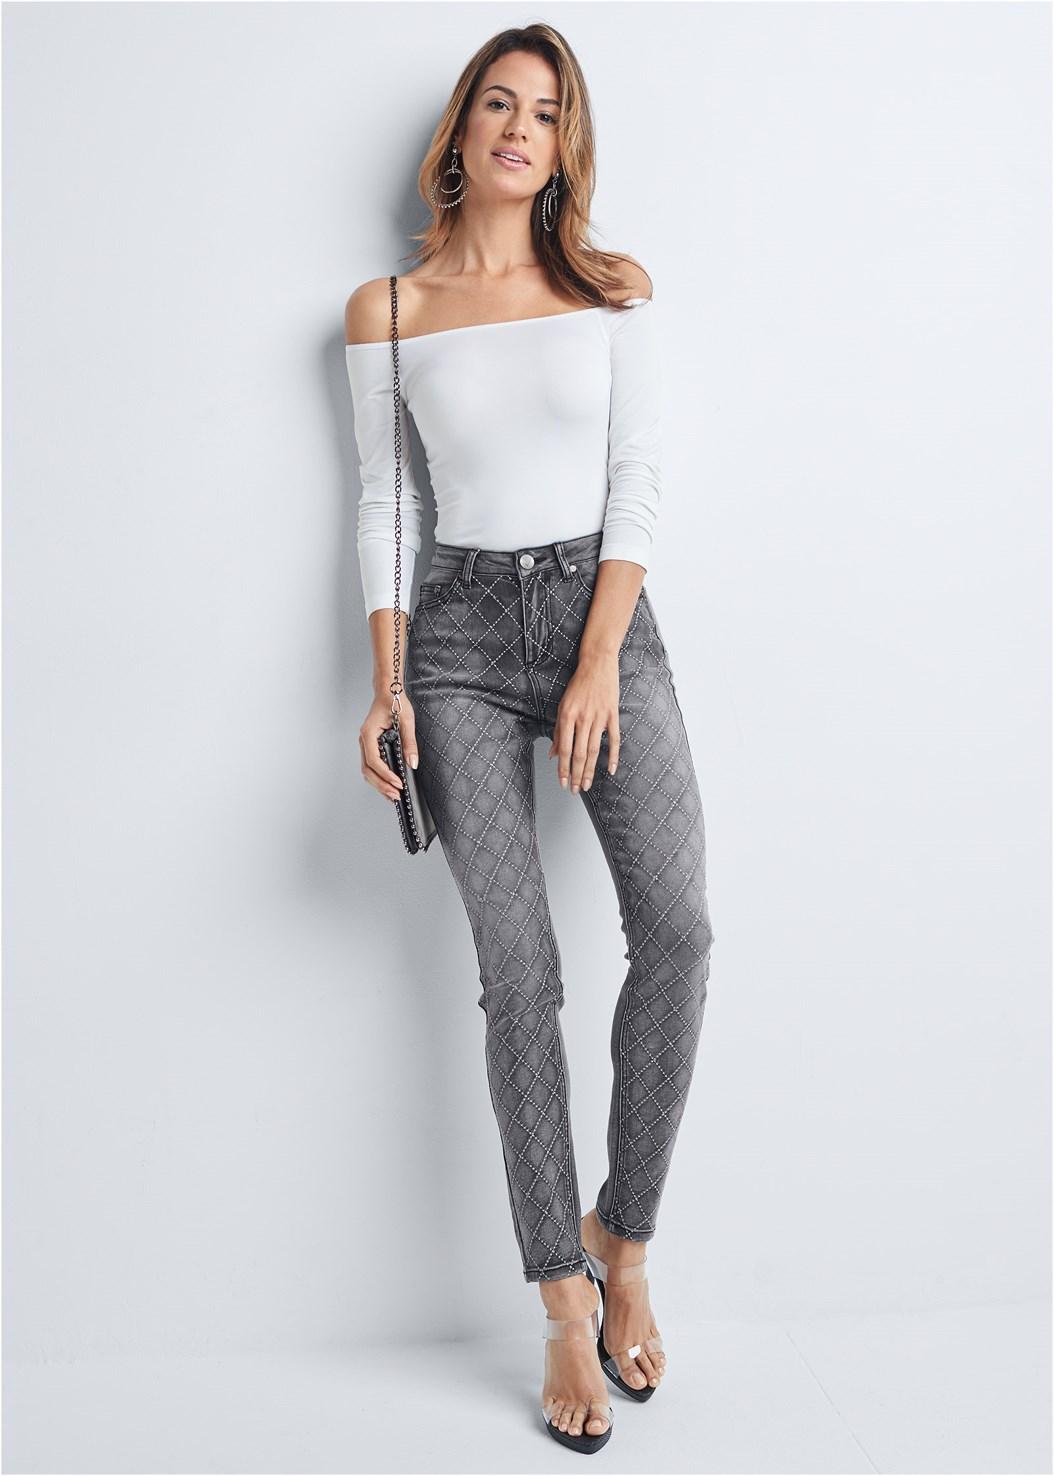 Embellished Skinny Jeans,Off The Shoulder Top,Mid Rise Color Skinny Jeans,Full Figure Strapless Bra,Lucite Strap Heels,Studded Matte Hoops,Studded Chain Strap Bag